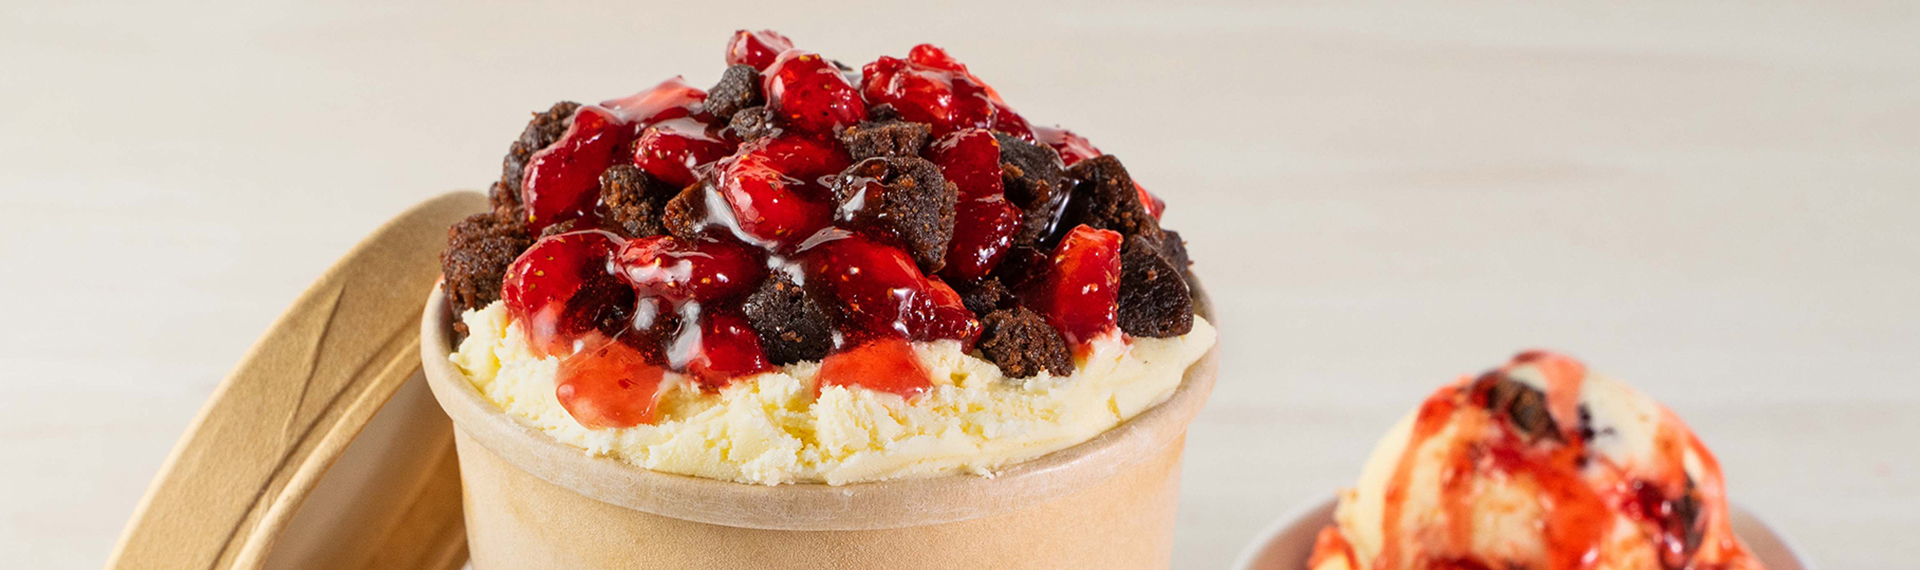 Berry Brownie – ½ Pint